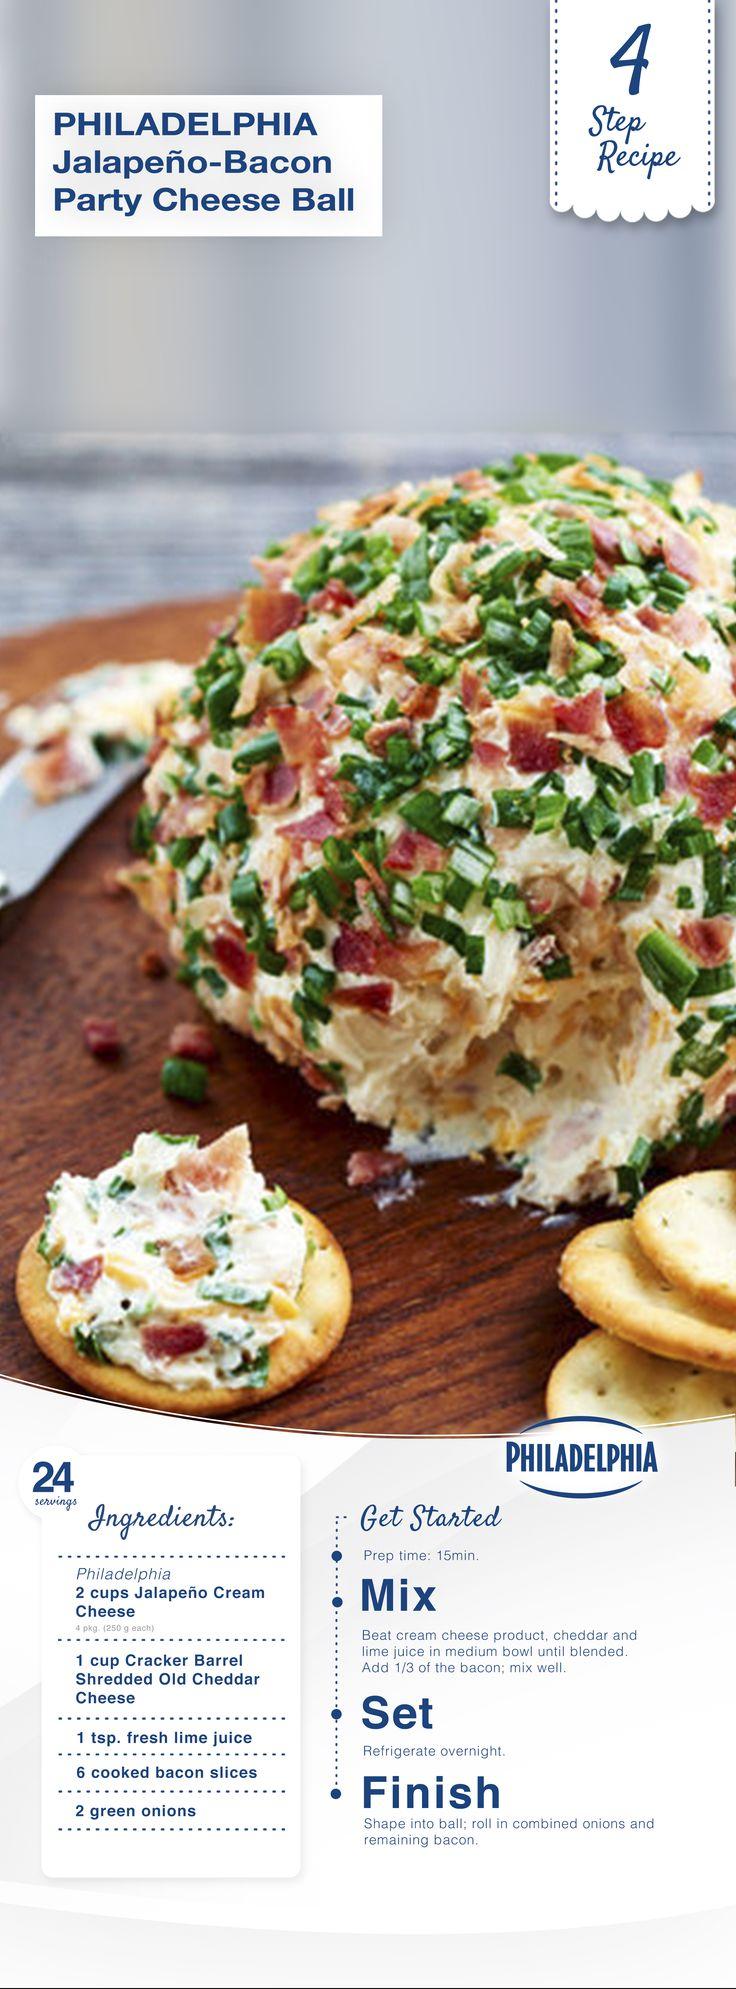 Jalapeño-Bacon Party Cheese Ball